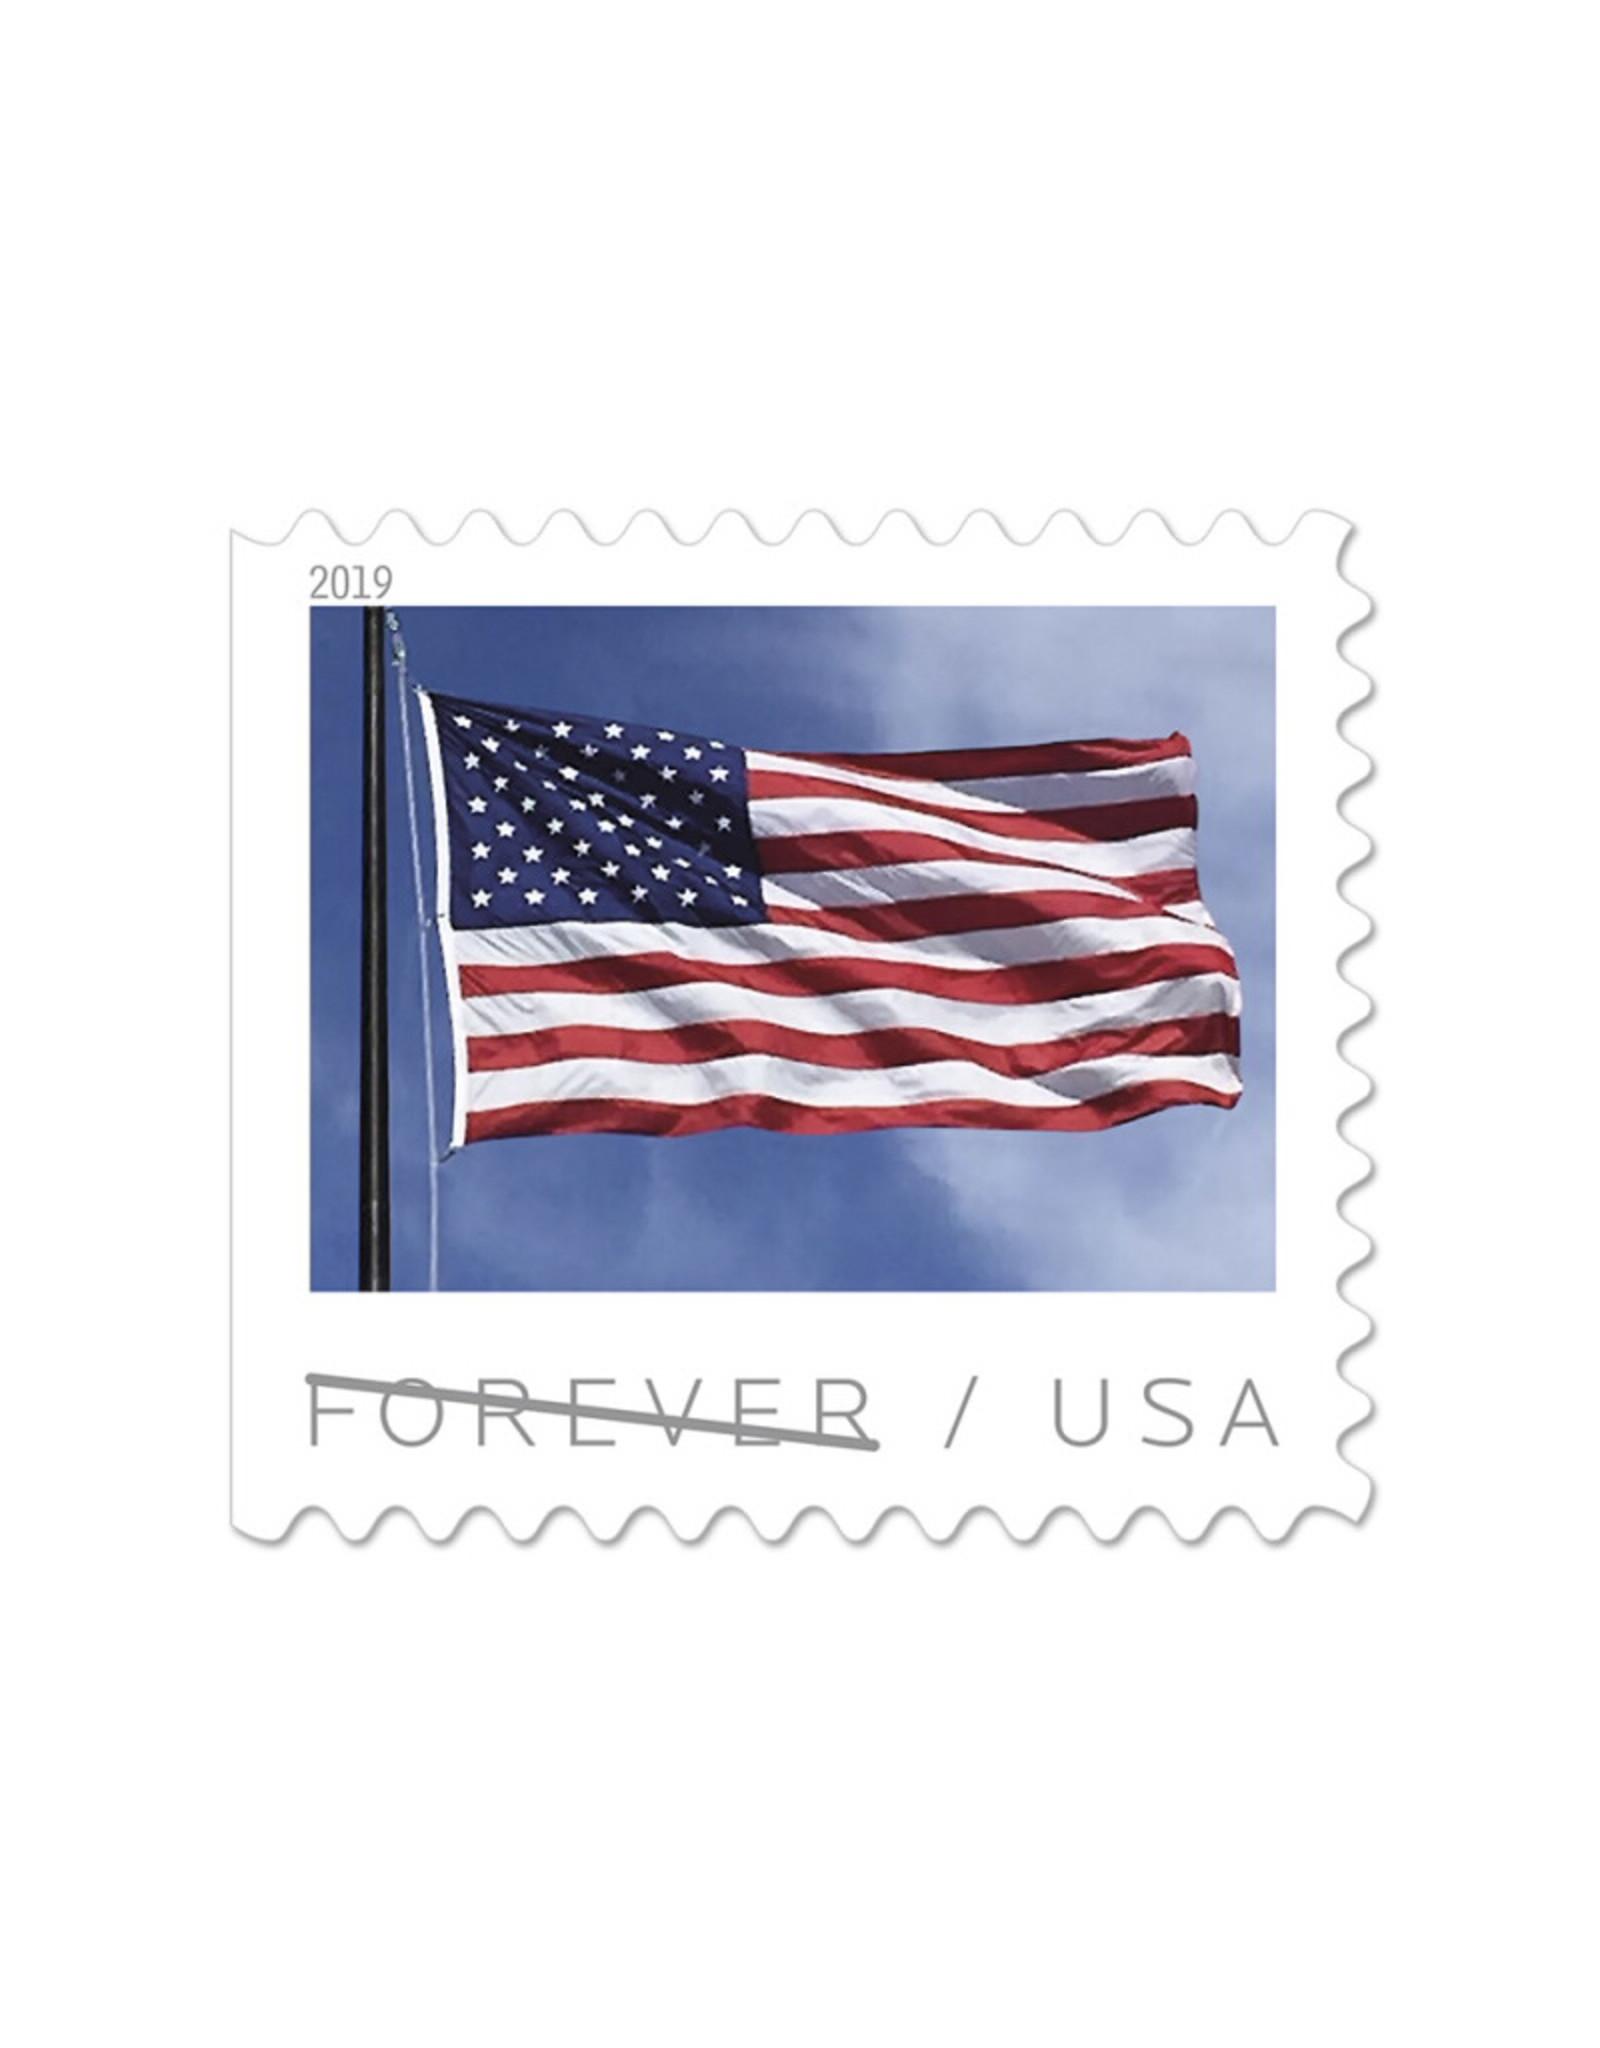 USPS One USPS Stamp